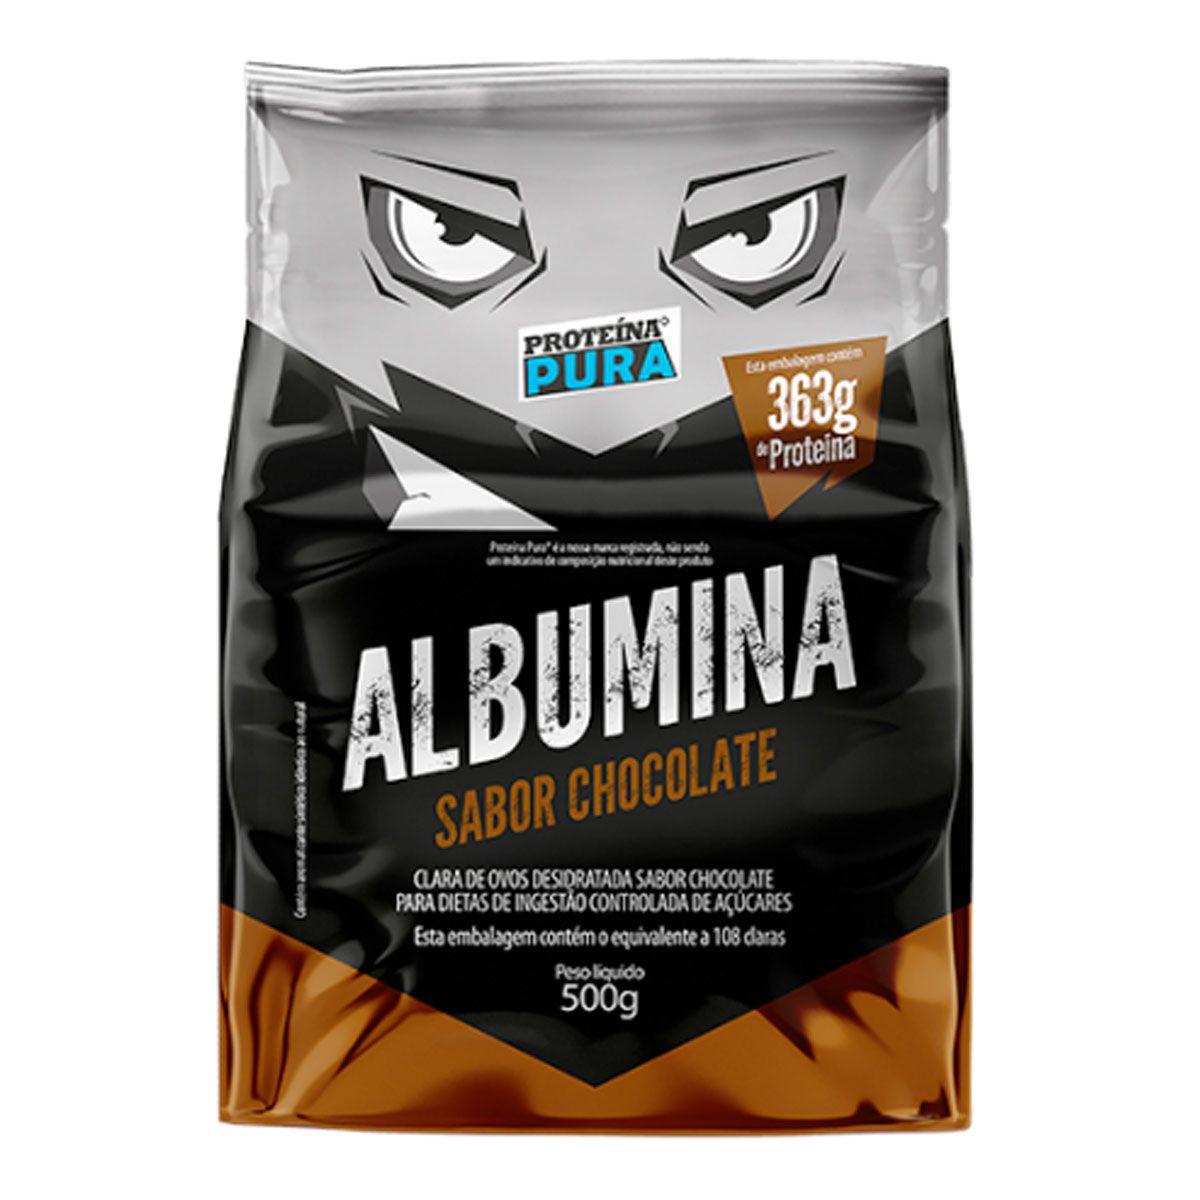 Albumina Proteina Pura (500g)